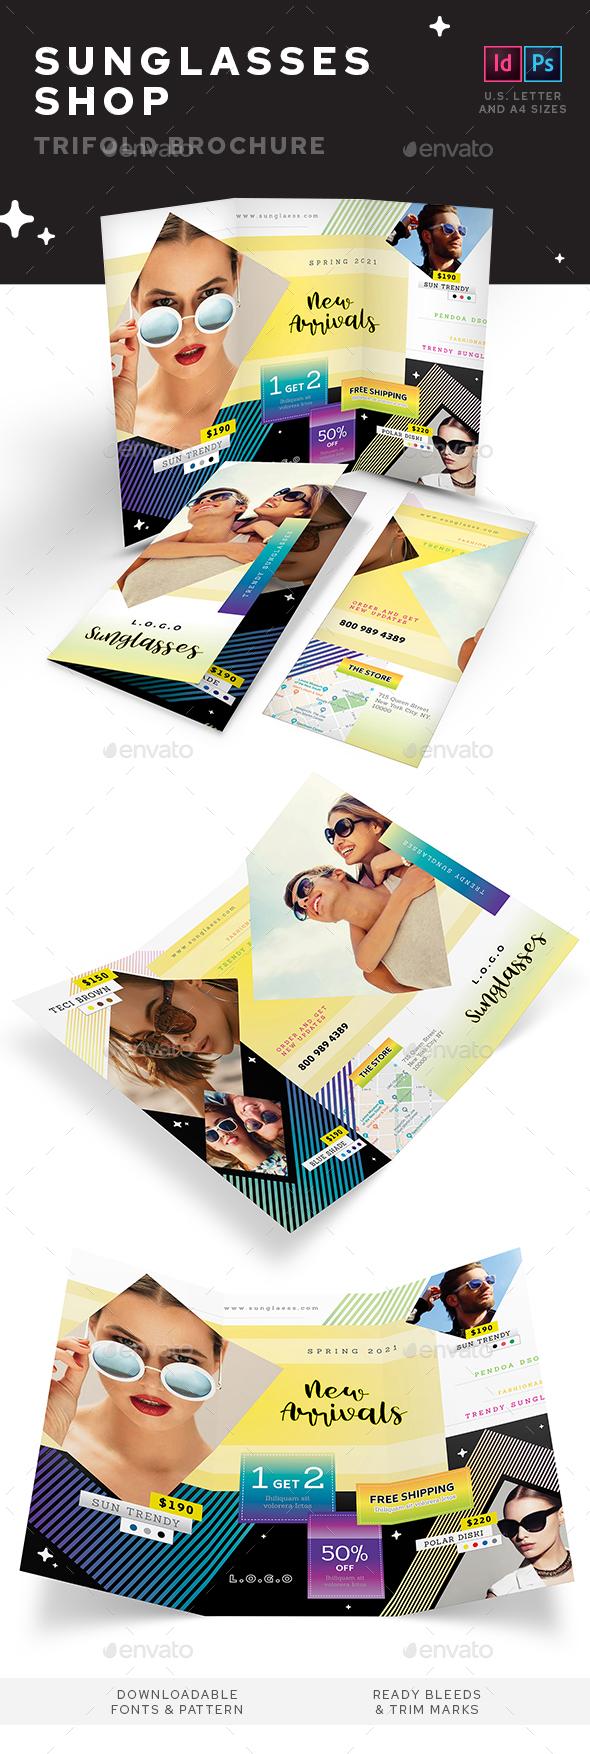 Sunglasses Shop Trifold Brochure